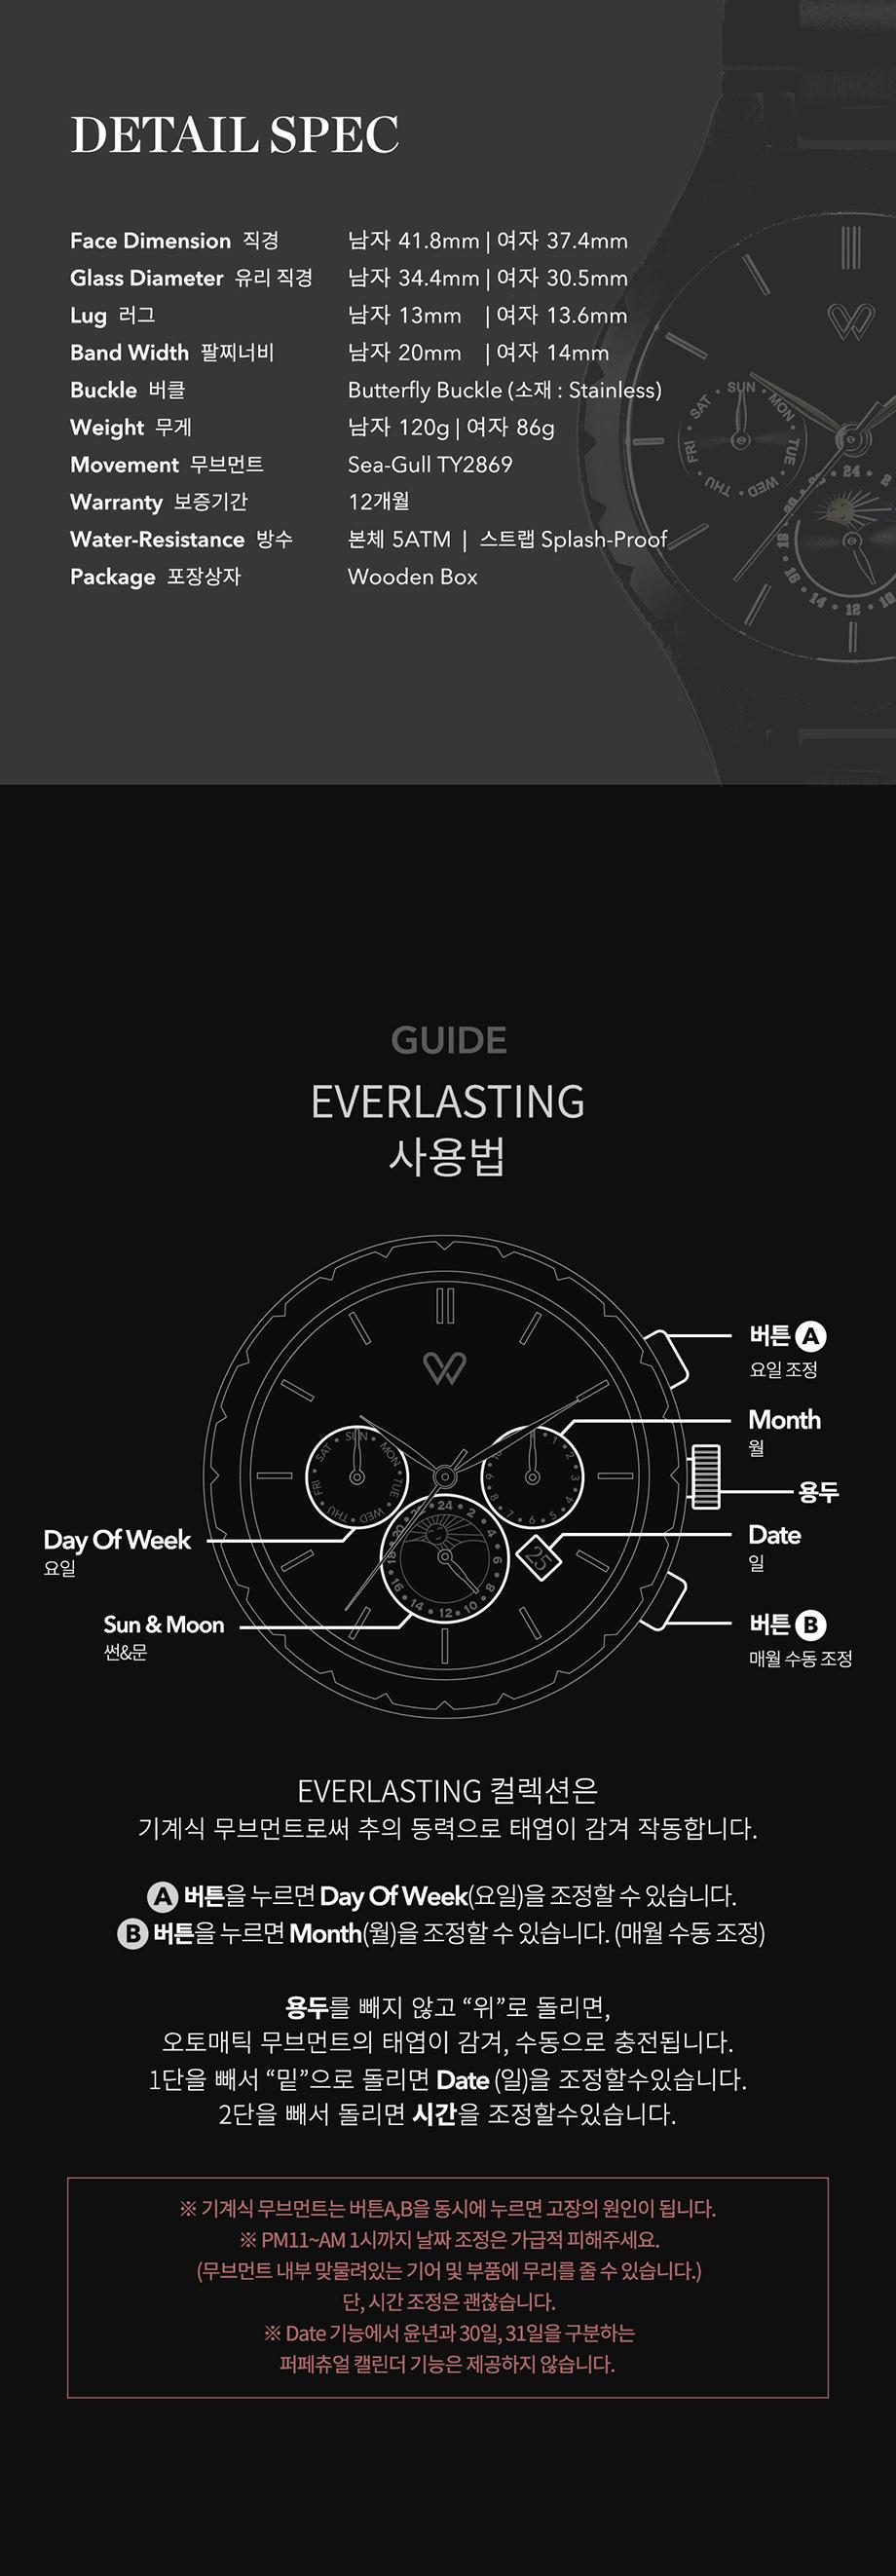 Everlasting - Romantic Sunset Couple - 보우드, 899,000원, 시계세트, 커플시계